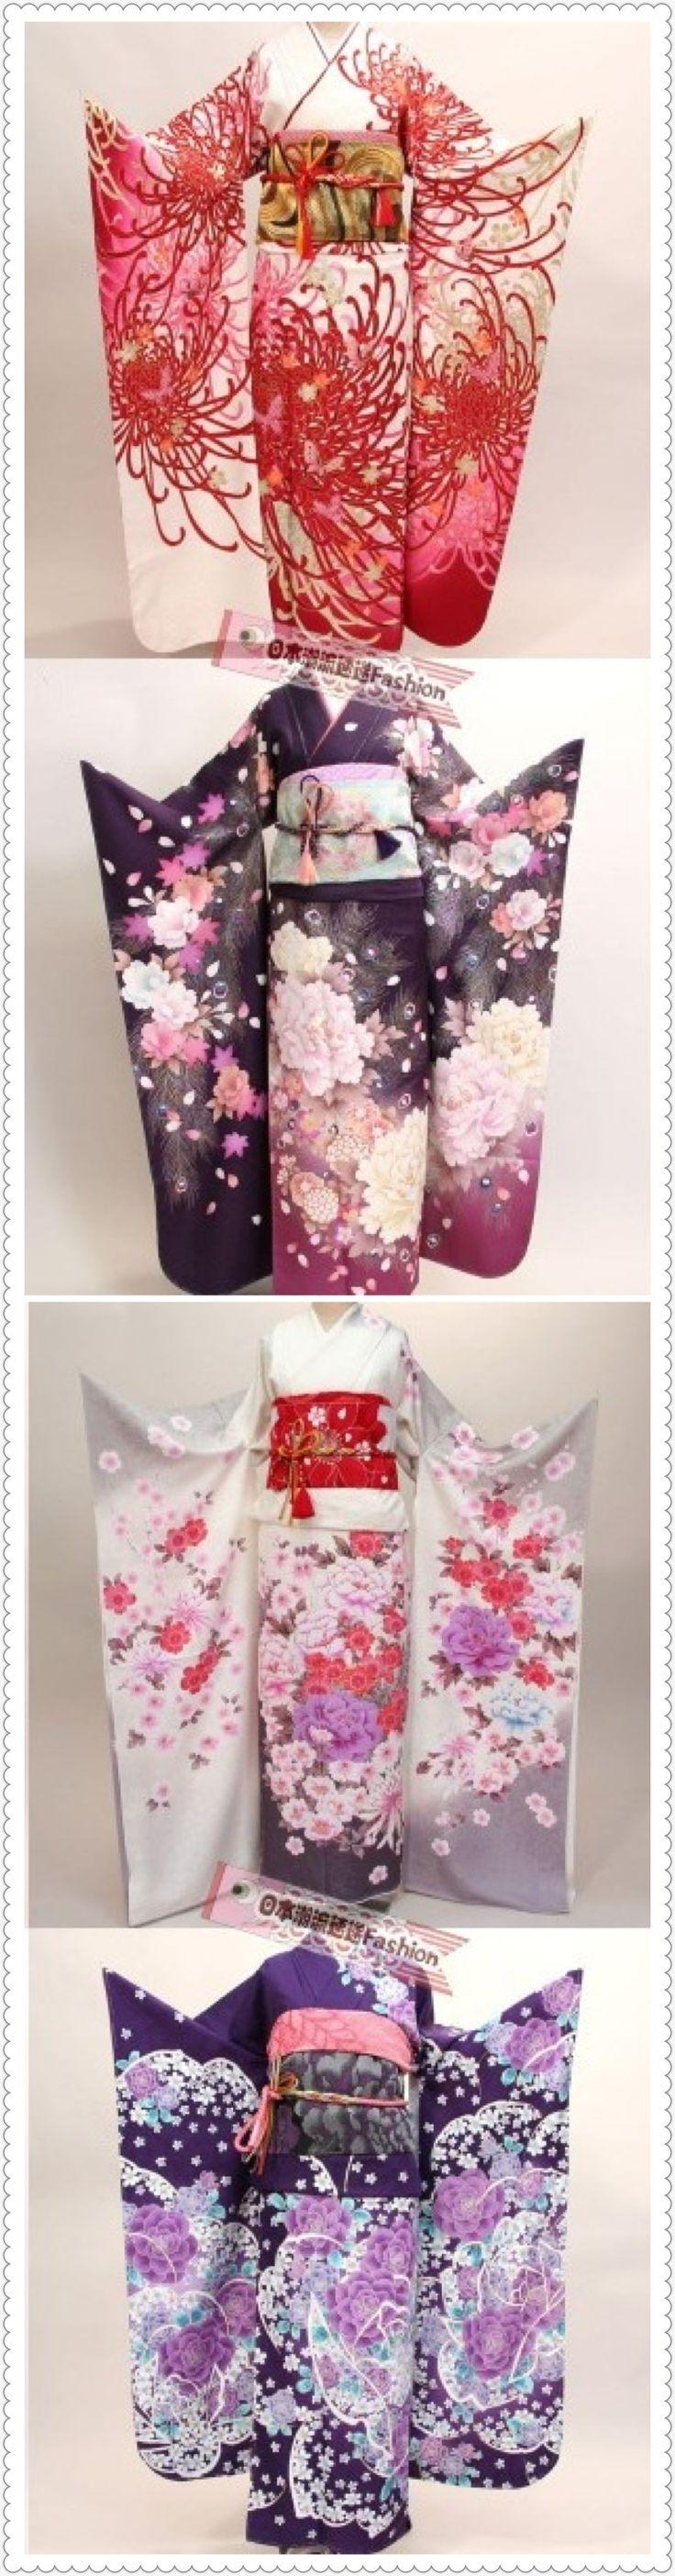 ~Japanese Kimonos | House of Beccaria#